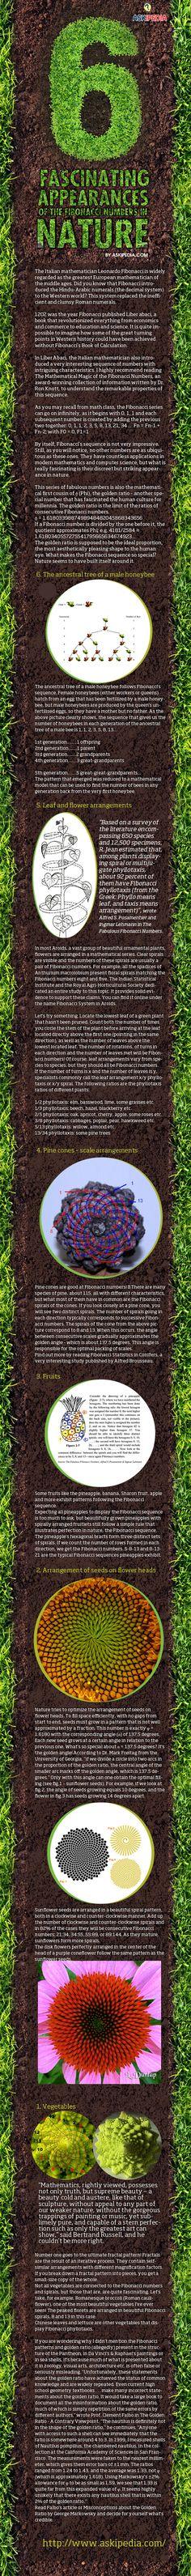 Beautiful infographic: 6 Fascinating Appearances of the Fibonacci Numbers in Nature